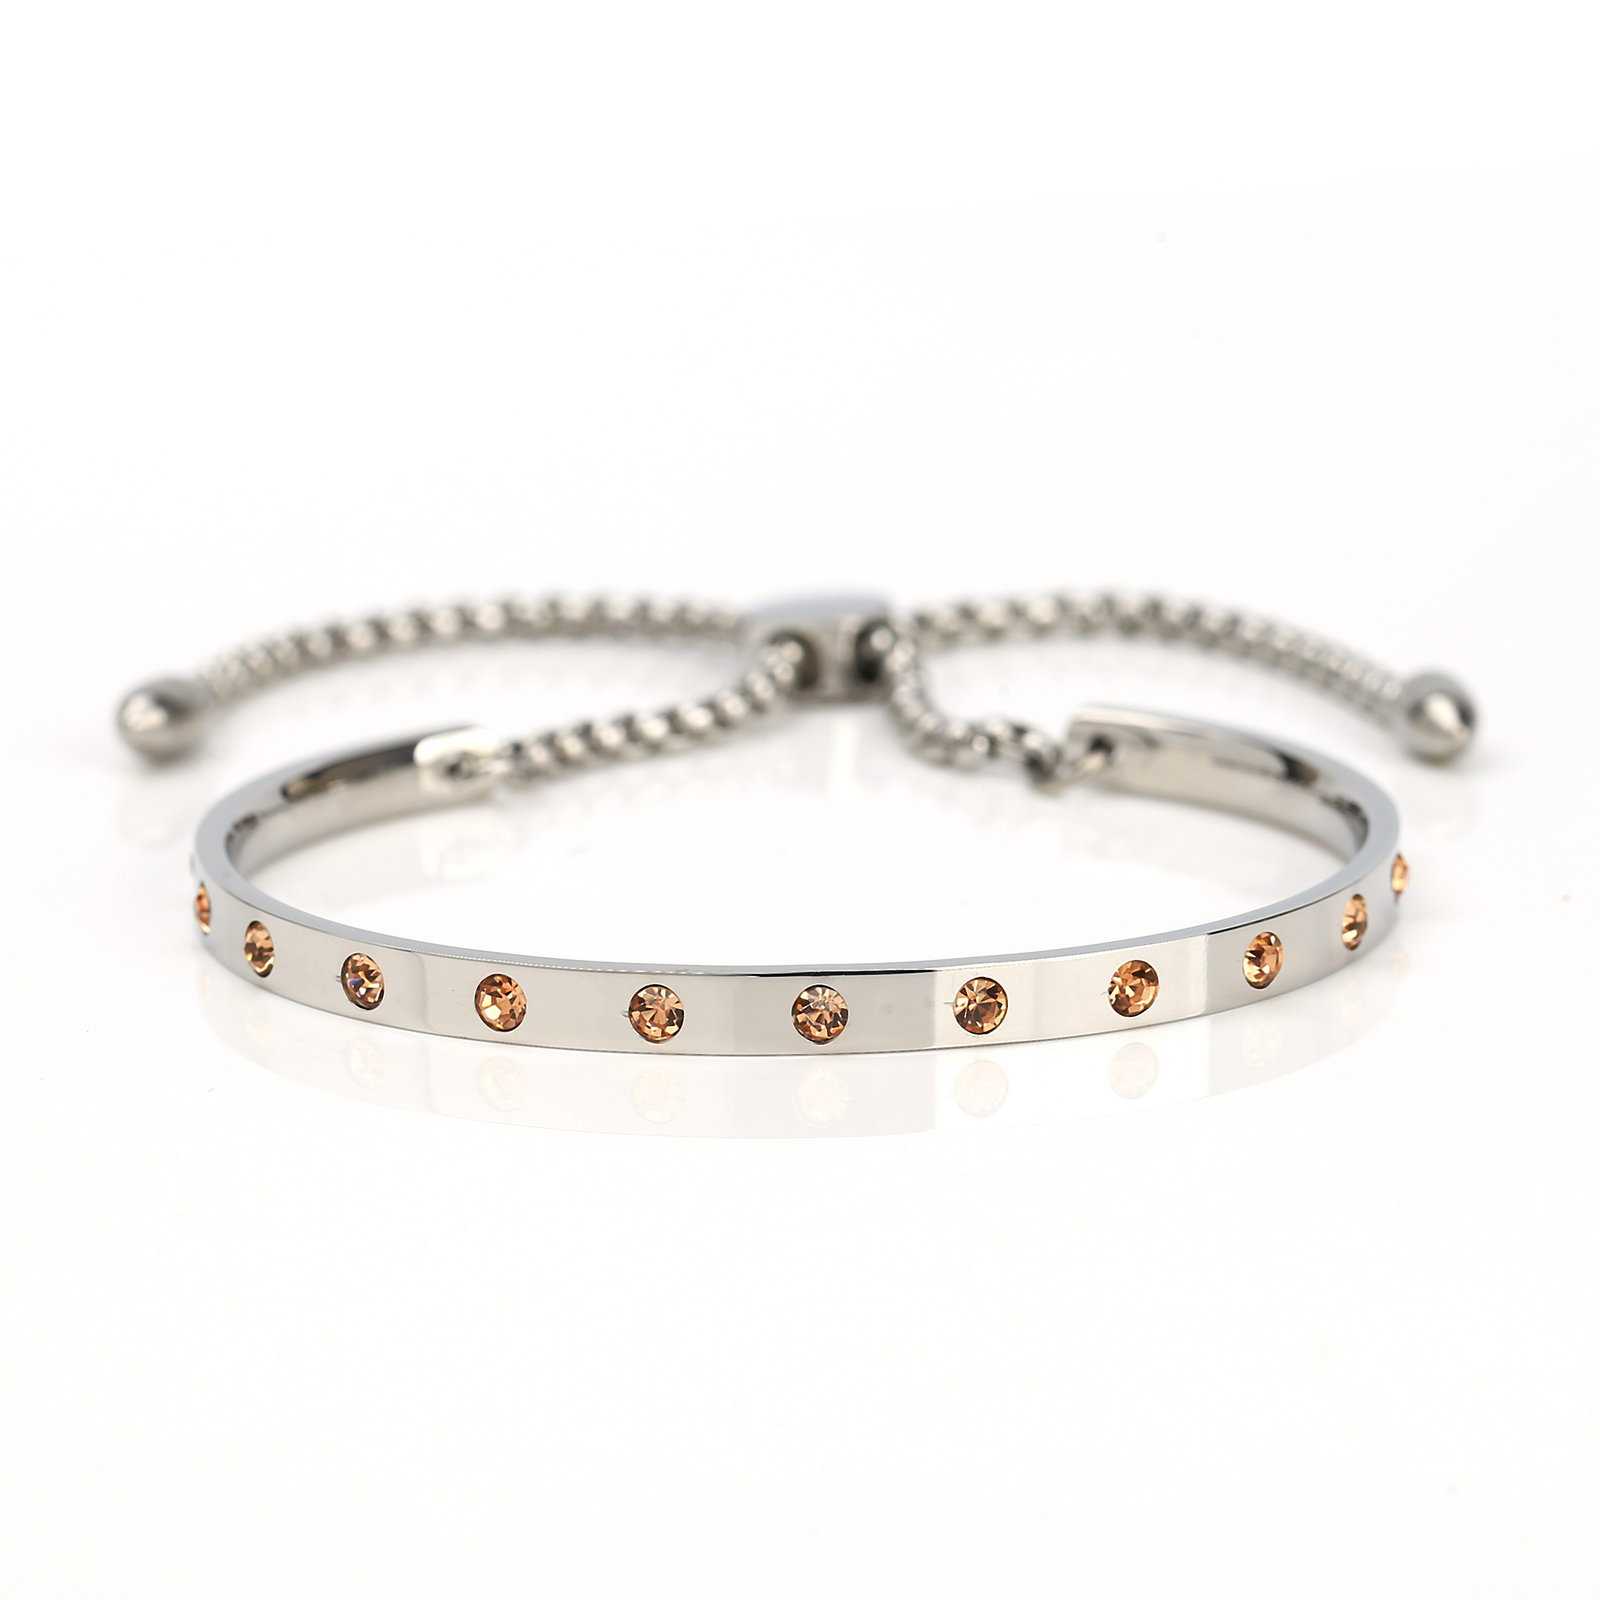 UNITED ELEGANCE Silver Tone Bolo Bracelet, Champagne Swarovski Style Crystals